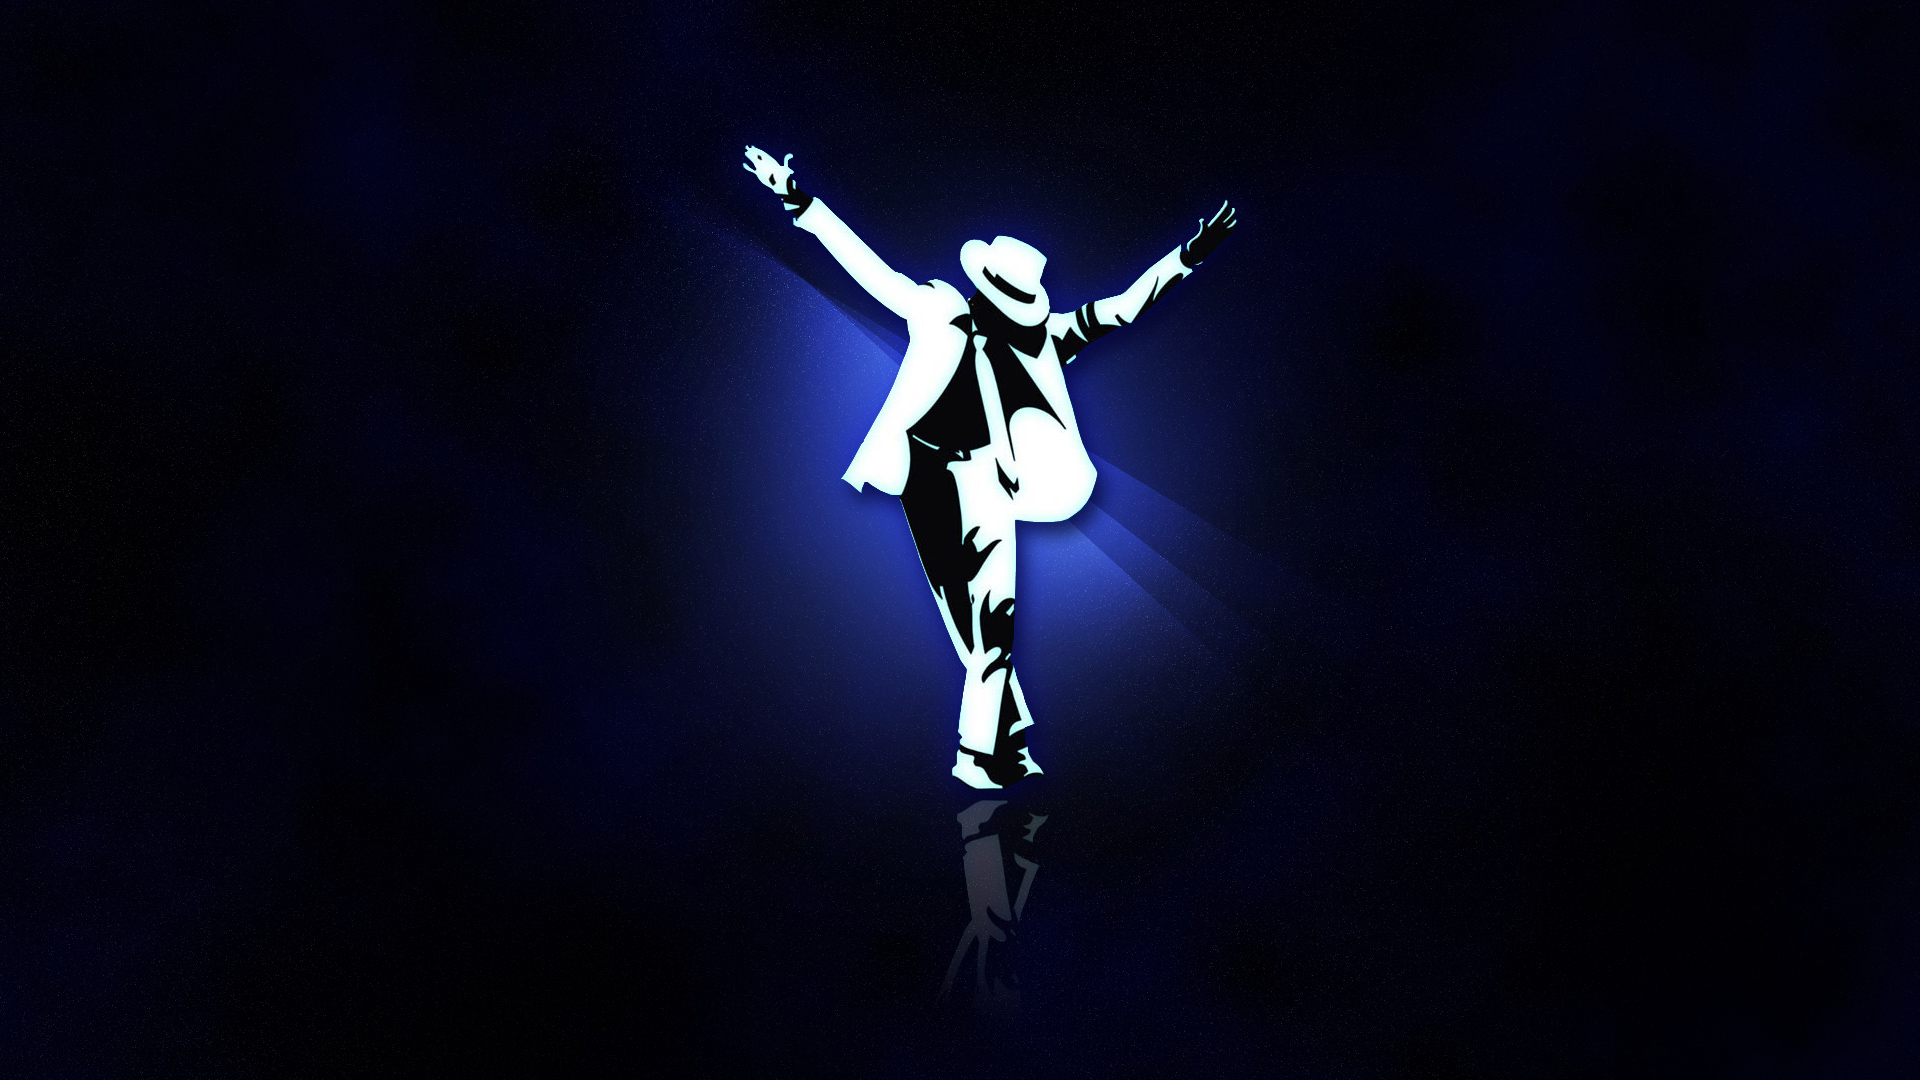 Dance wallpaper   I love to dance Wallpaper 28549732 1920x1080